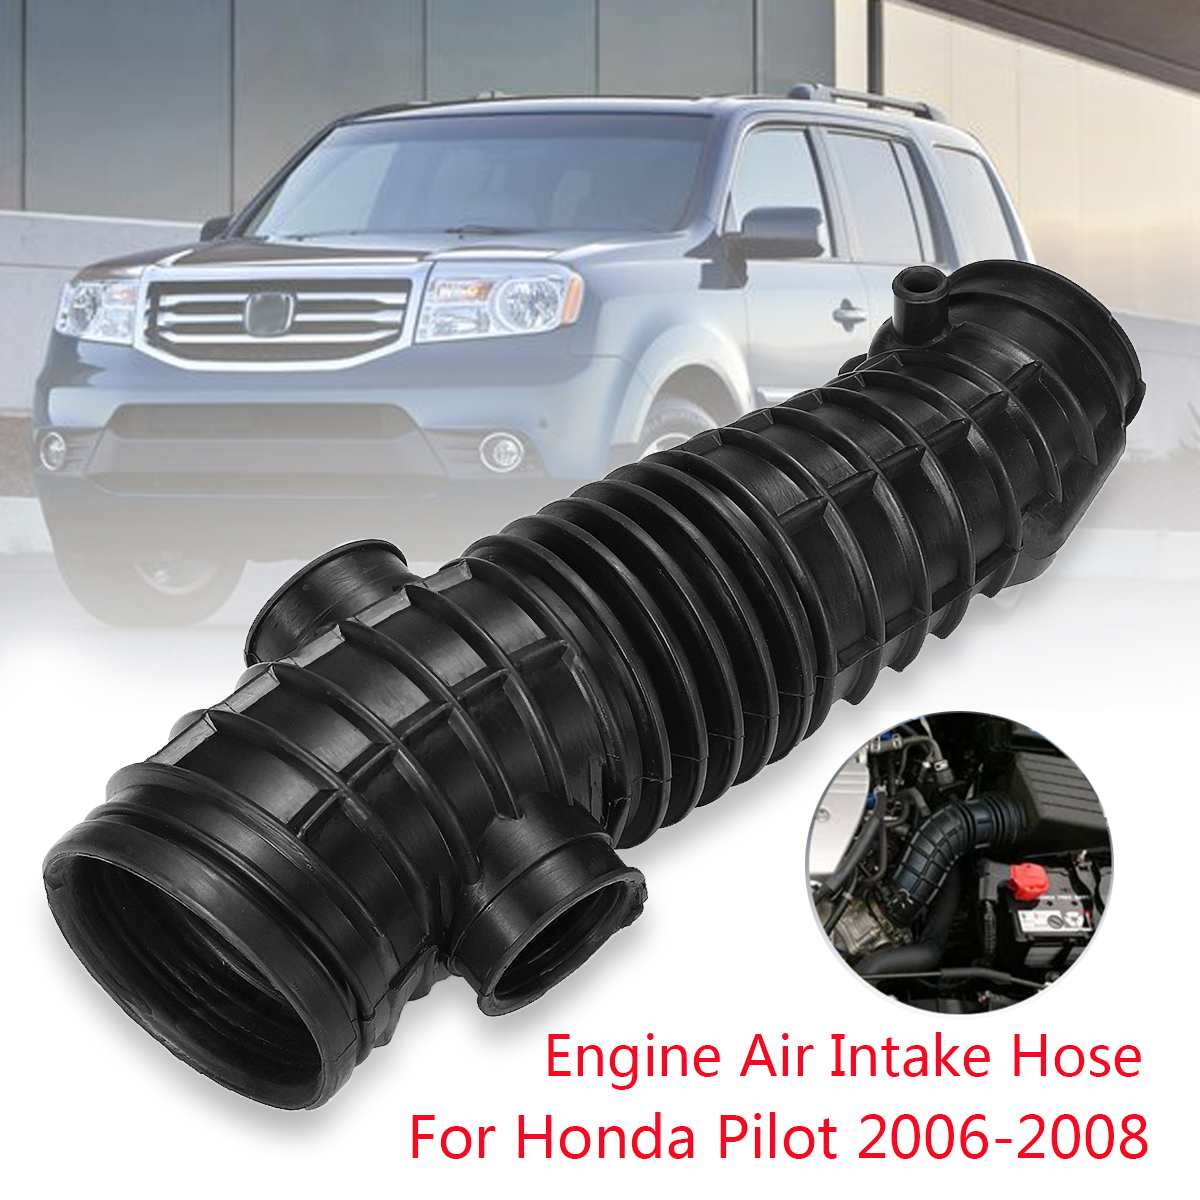 For Honda Pilot 2006-2008 Replacement Engine Air Cleaner Intake Hose V6-3.5L AIH551048H Durable Long Lifetime Guaranteed Black